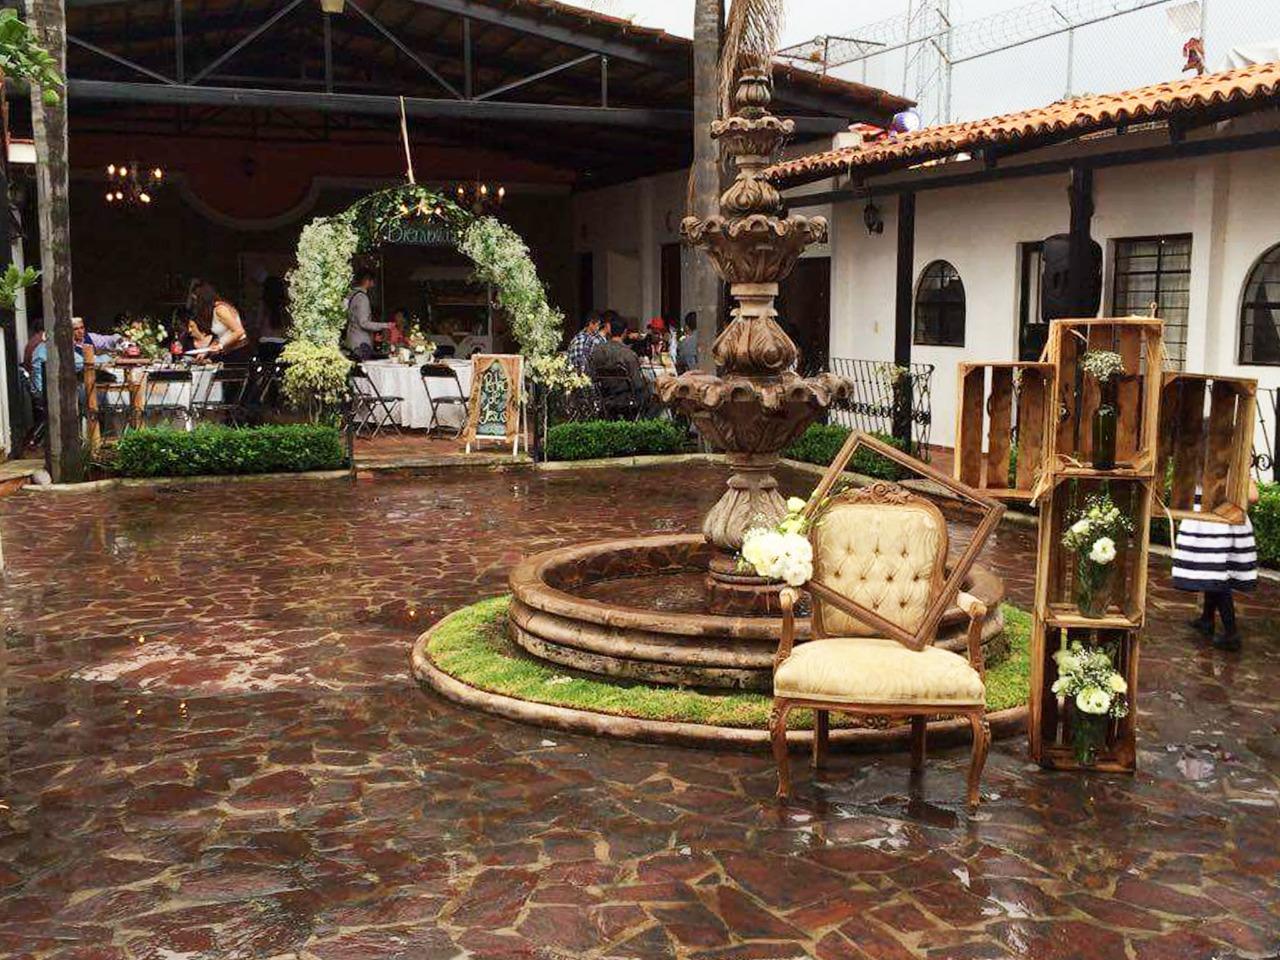 Imagen 6 del espacio Terraza Ayary Eventos en Zapopan, México